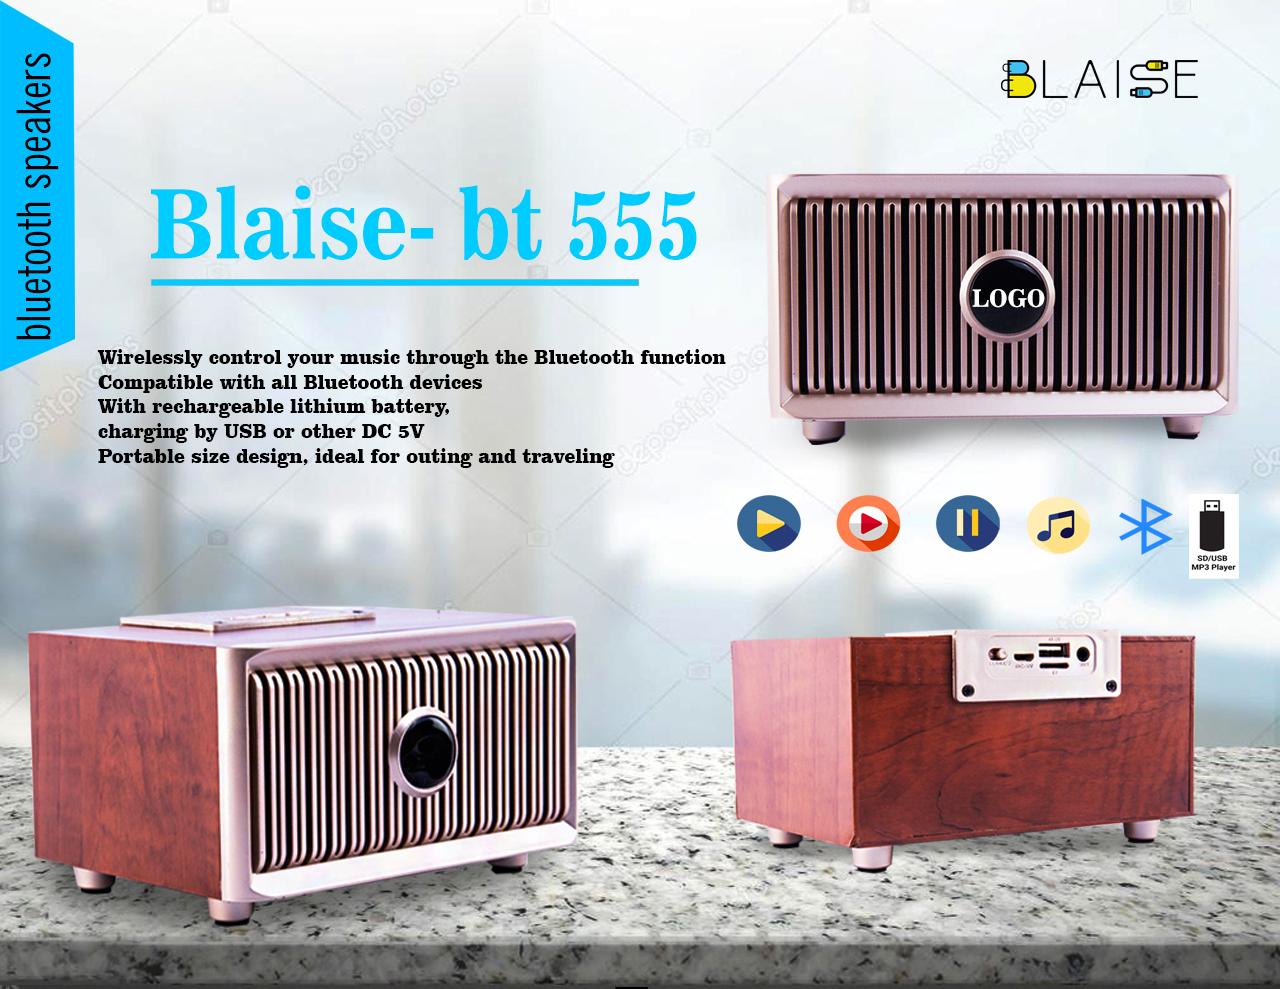 bt 555